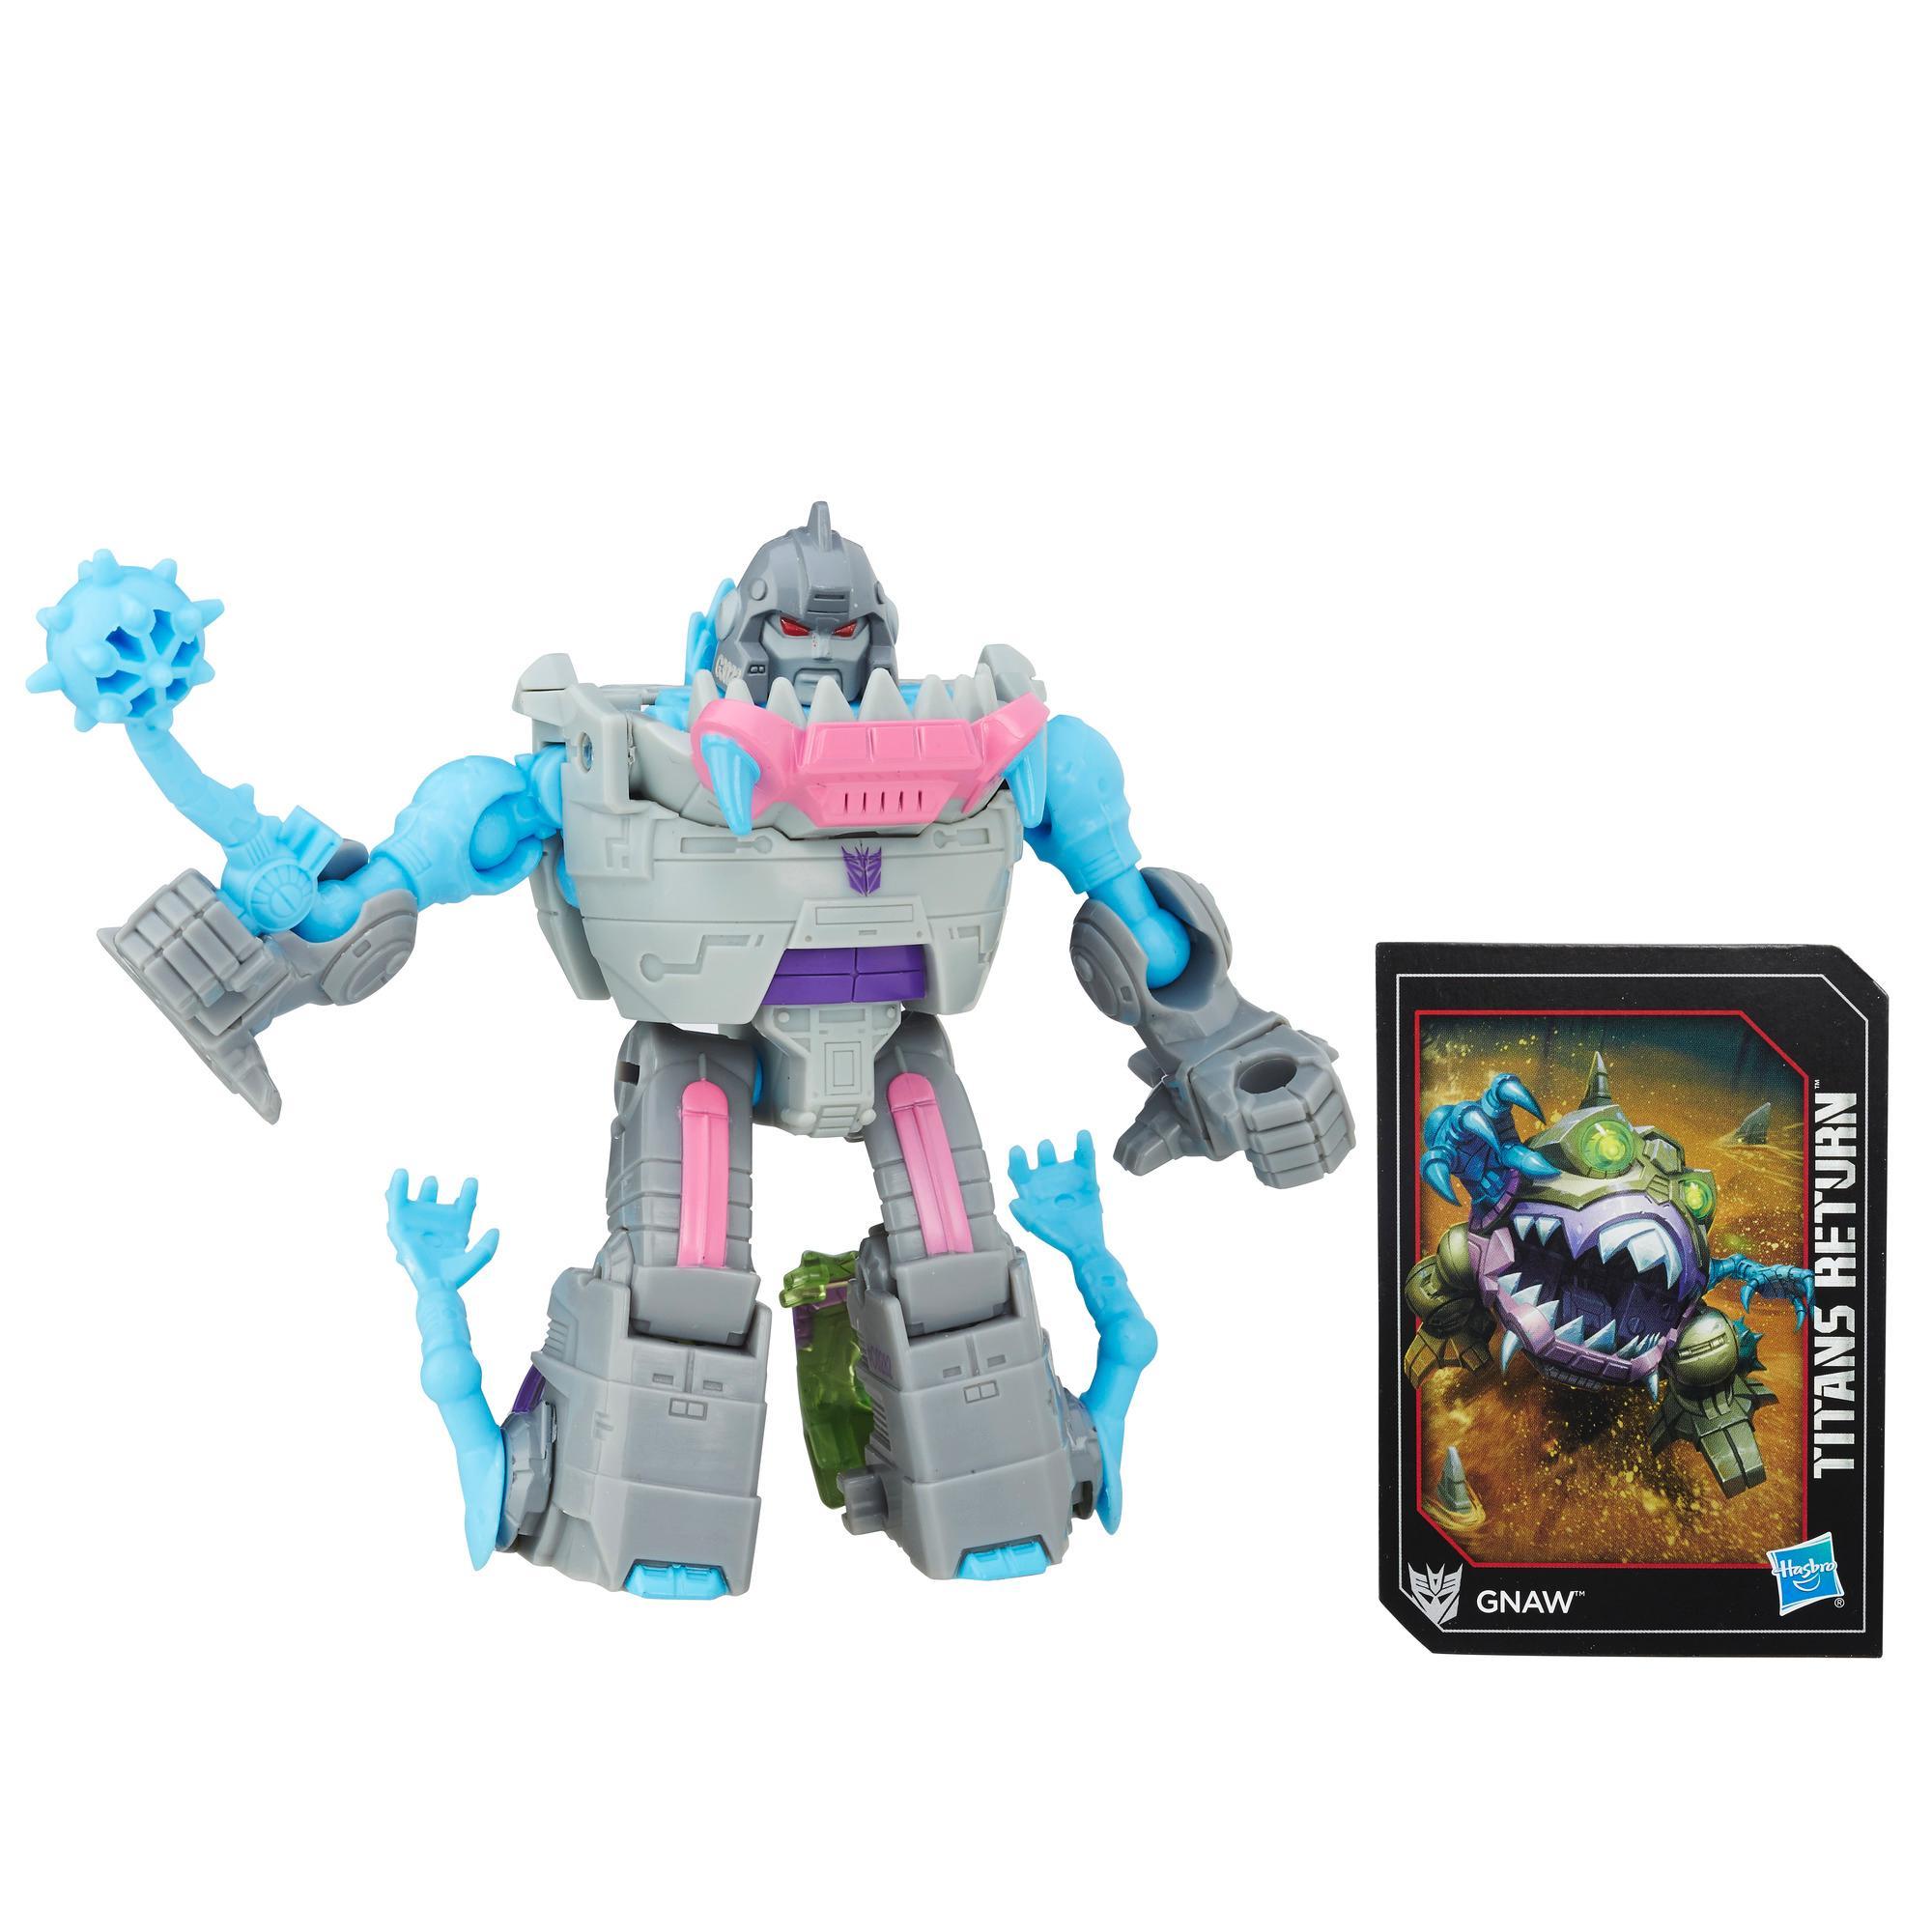 Transformers Generations Titans Return Legends GNAW